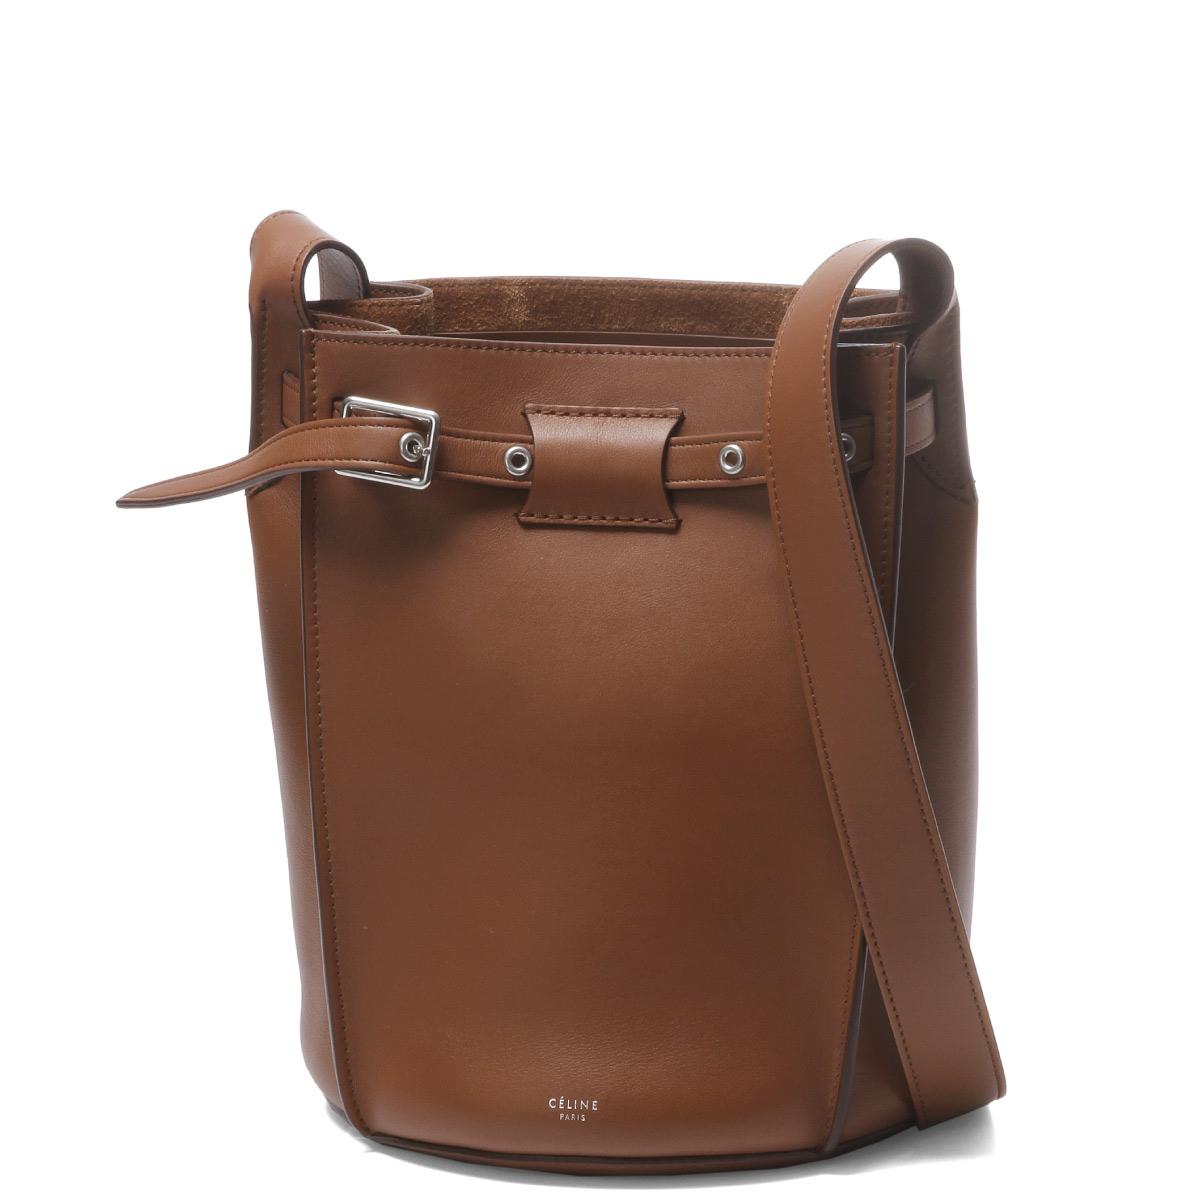 d42066fcd86 importshopdouble  Celine CELINE bag lady 183343A4T 04LU shoulder bag BIG  BAG BUCKET big bag pail TAN brown